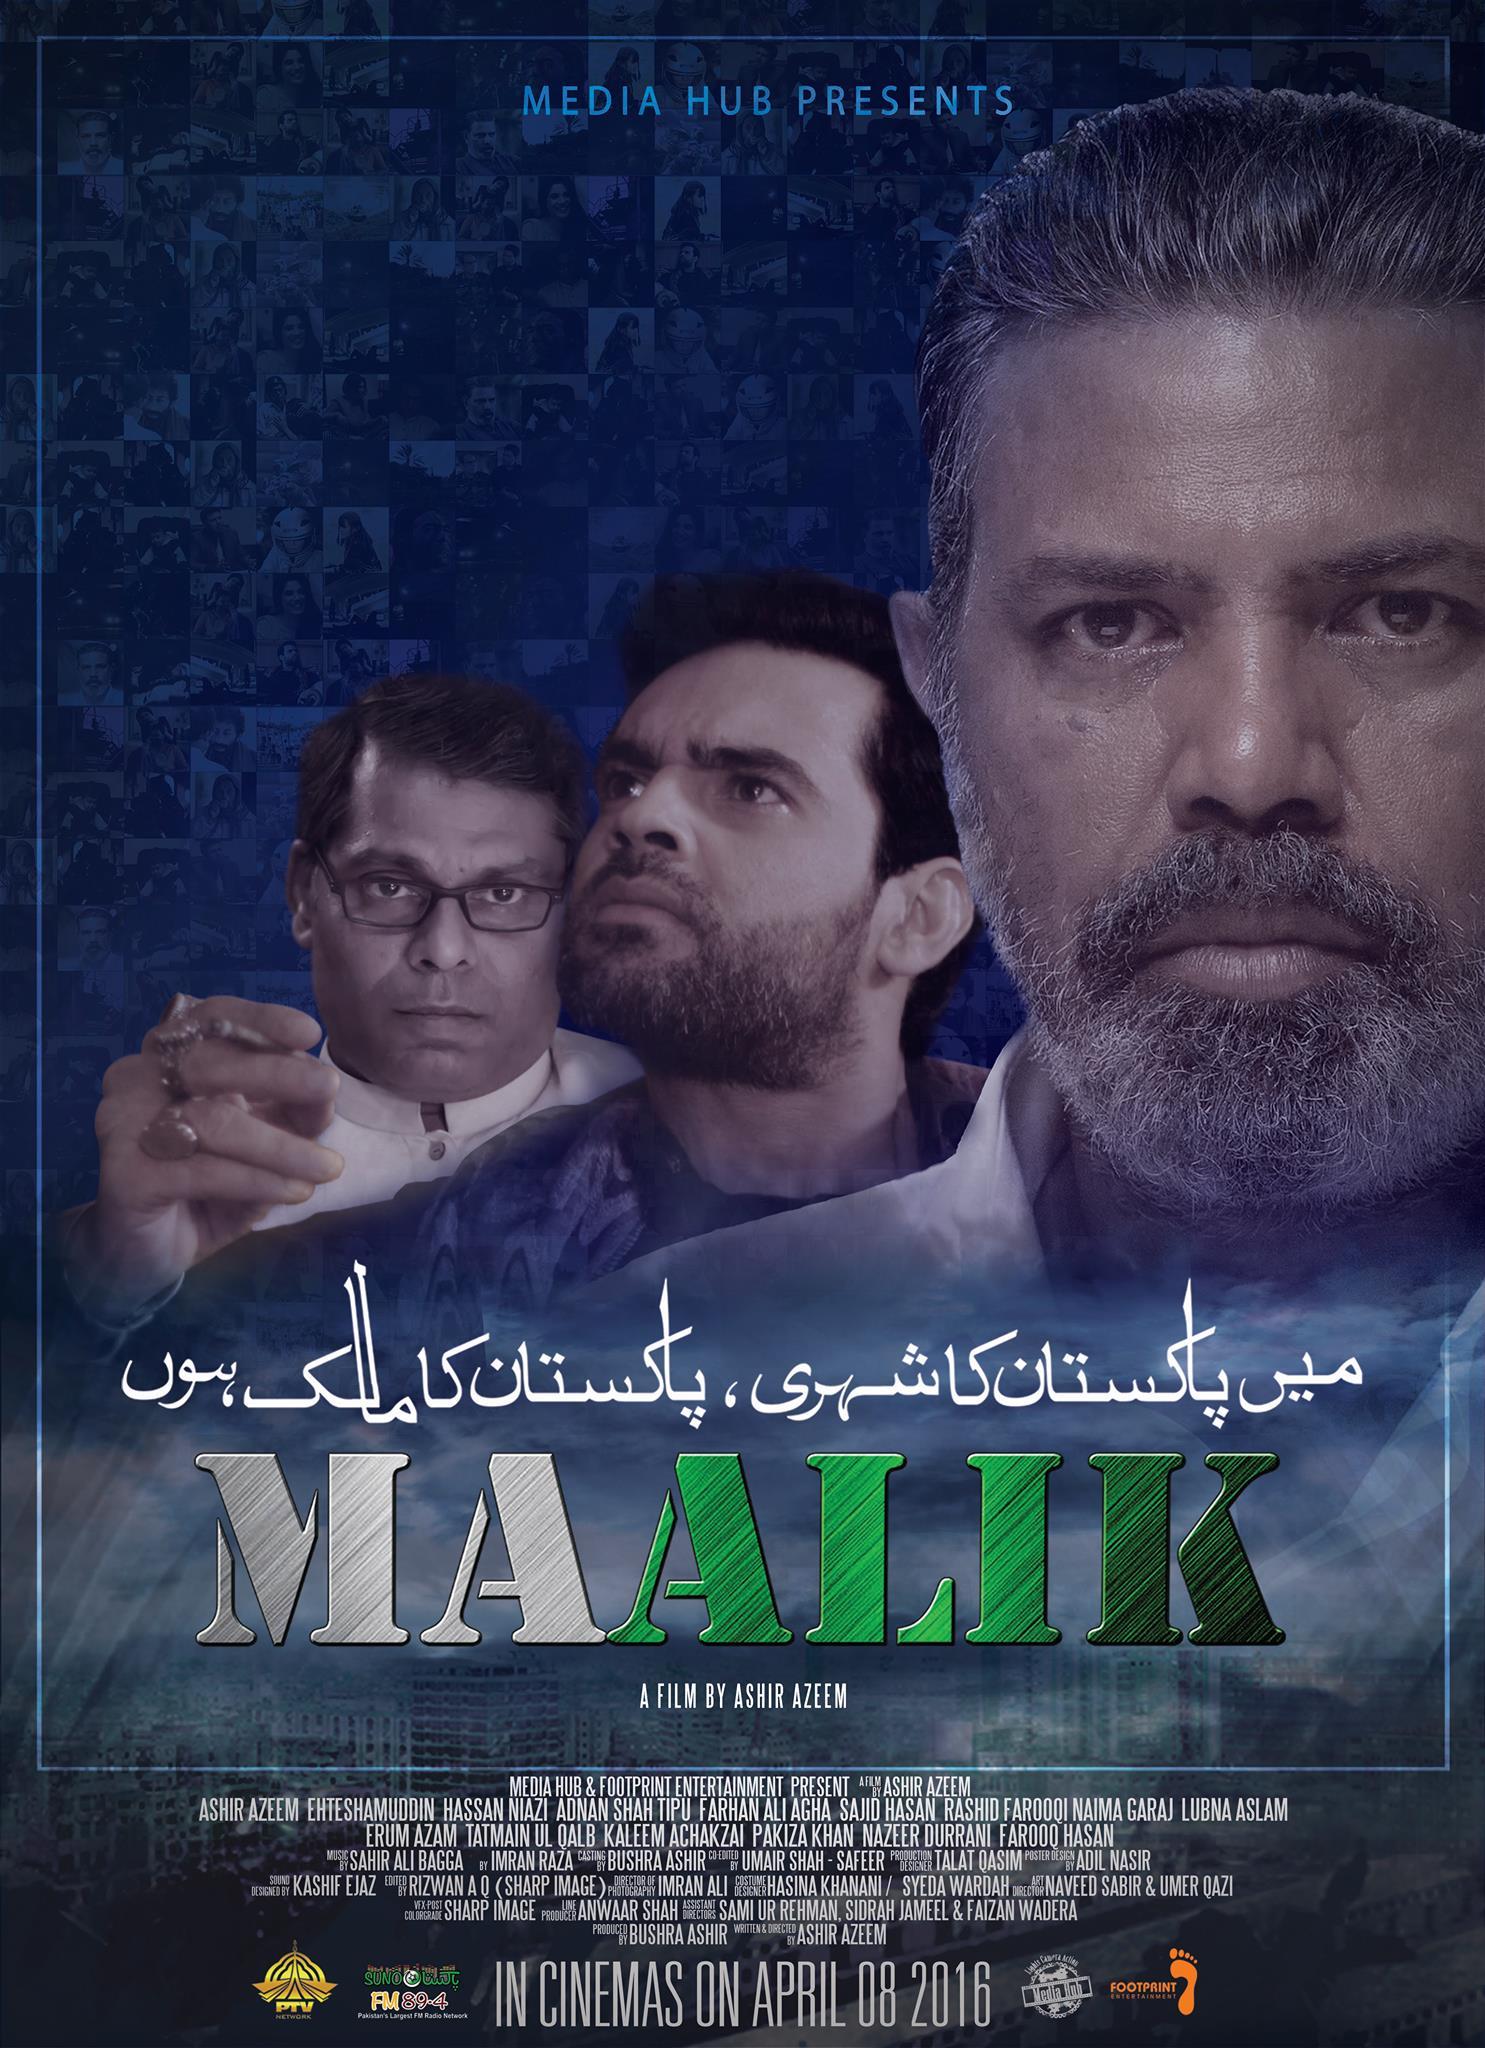 pakistani movies free download utorrent